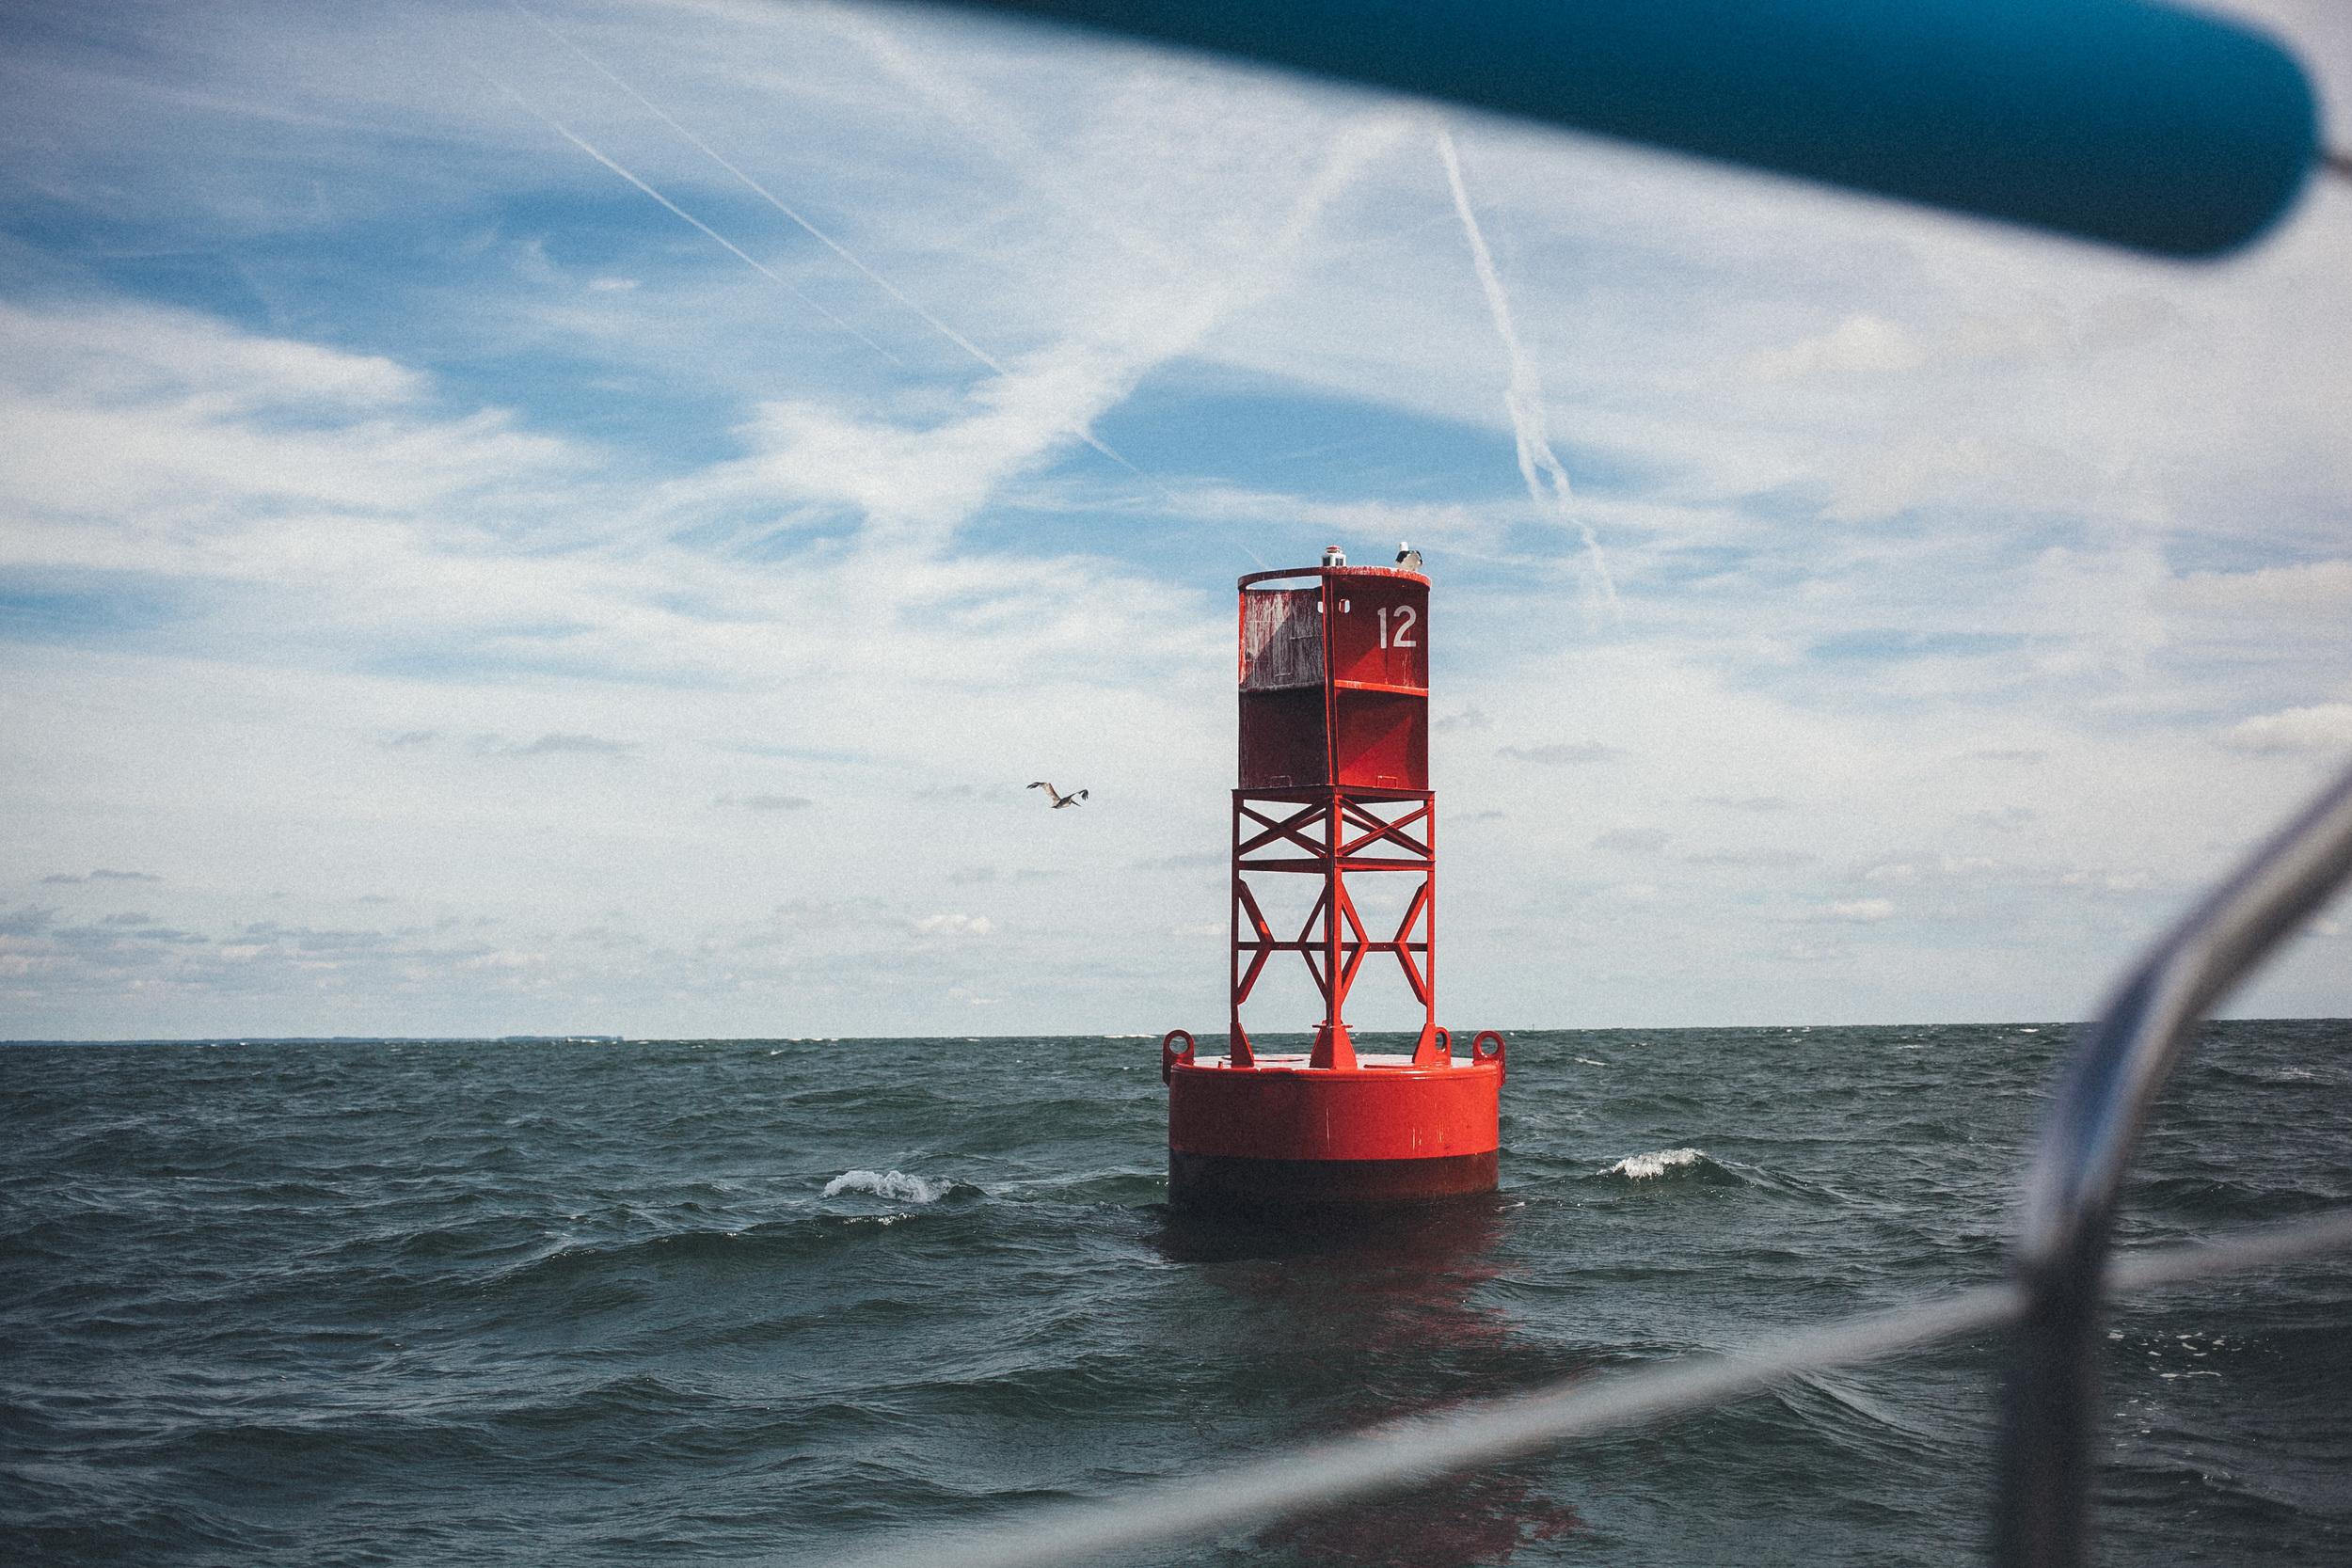 sailing-with-papa-5604.jpg